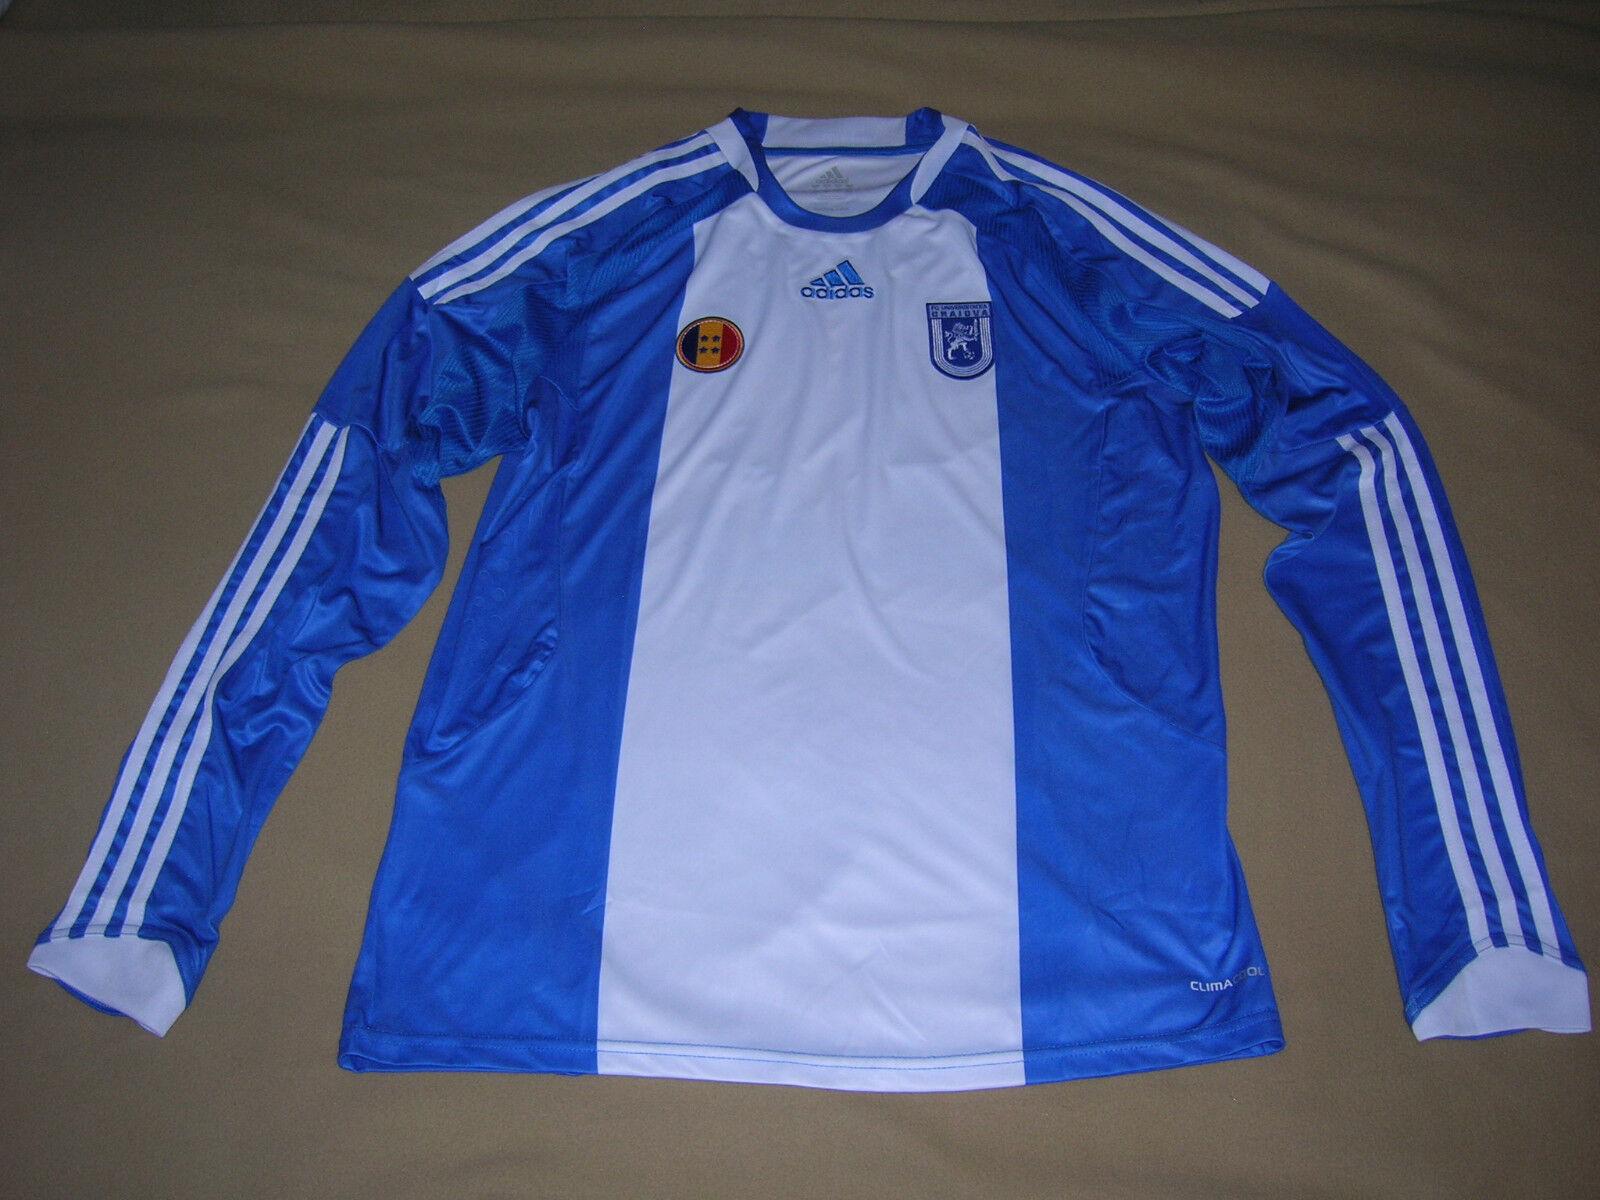 Universitatea Craiova Fussball Trikot Langarm Rumanien Rumanien Langarm Costea 9 9172ac